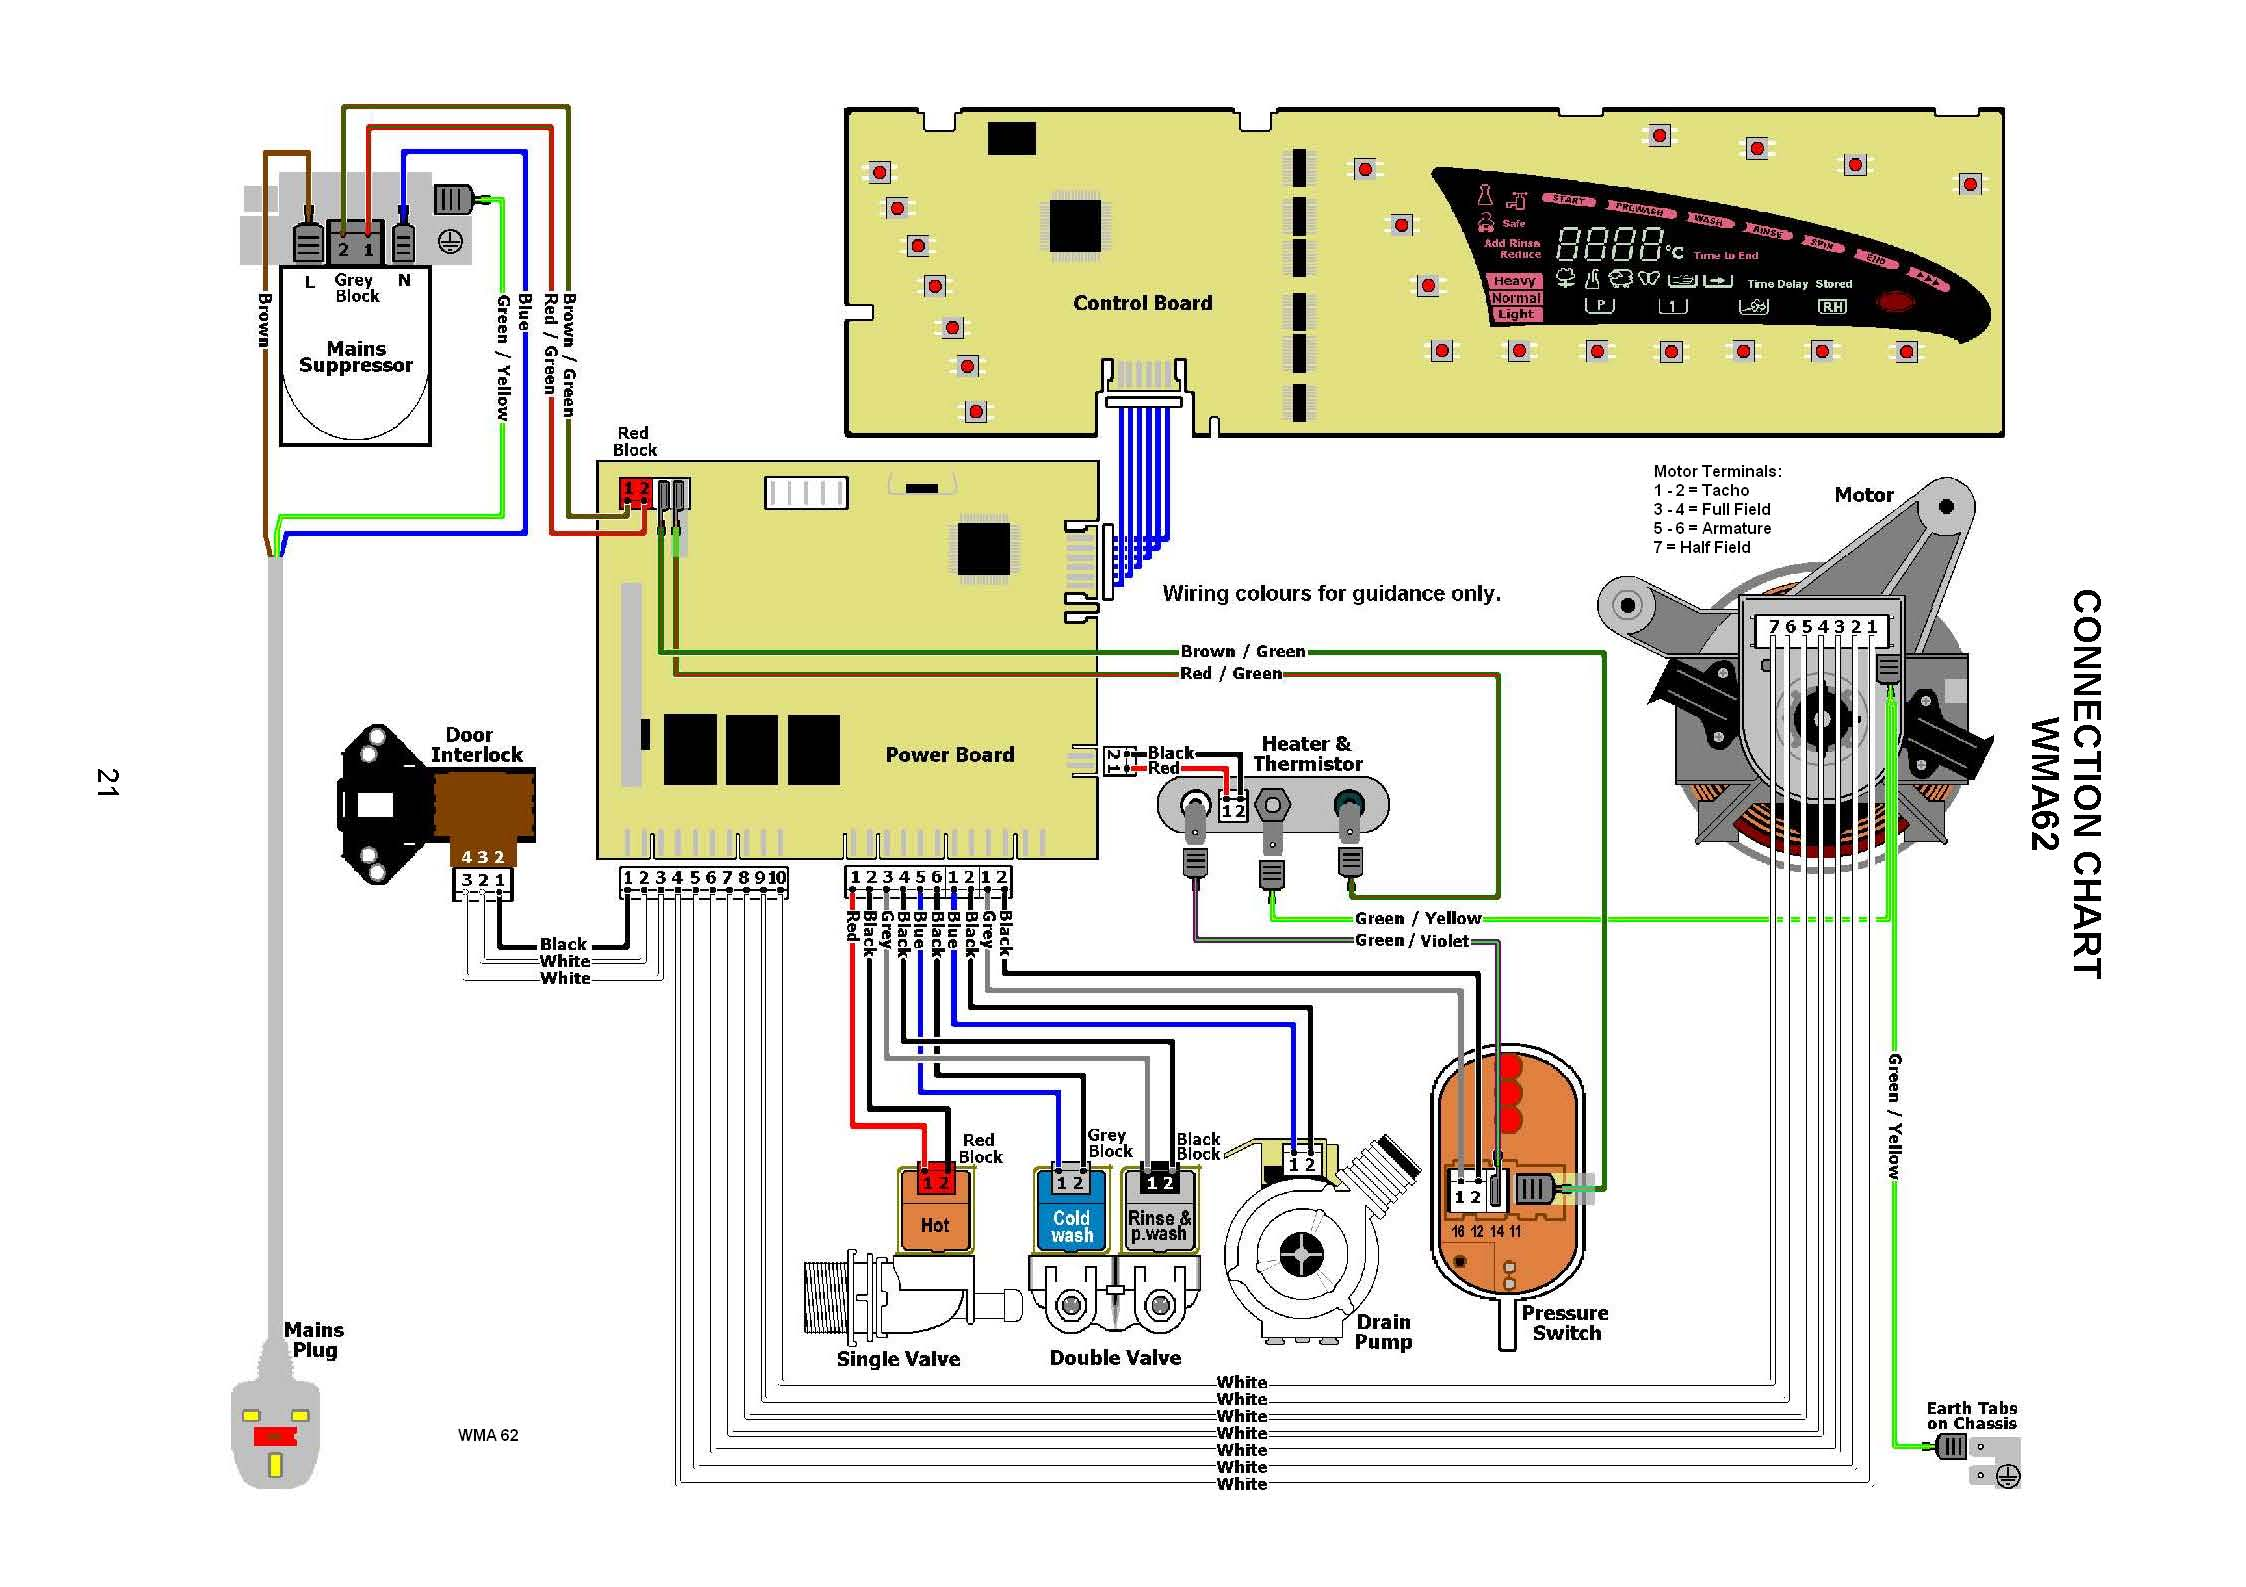 Wiring Diagram Hotpoint Washing Machine